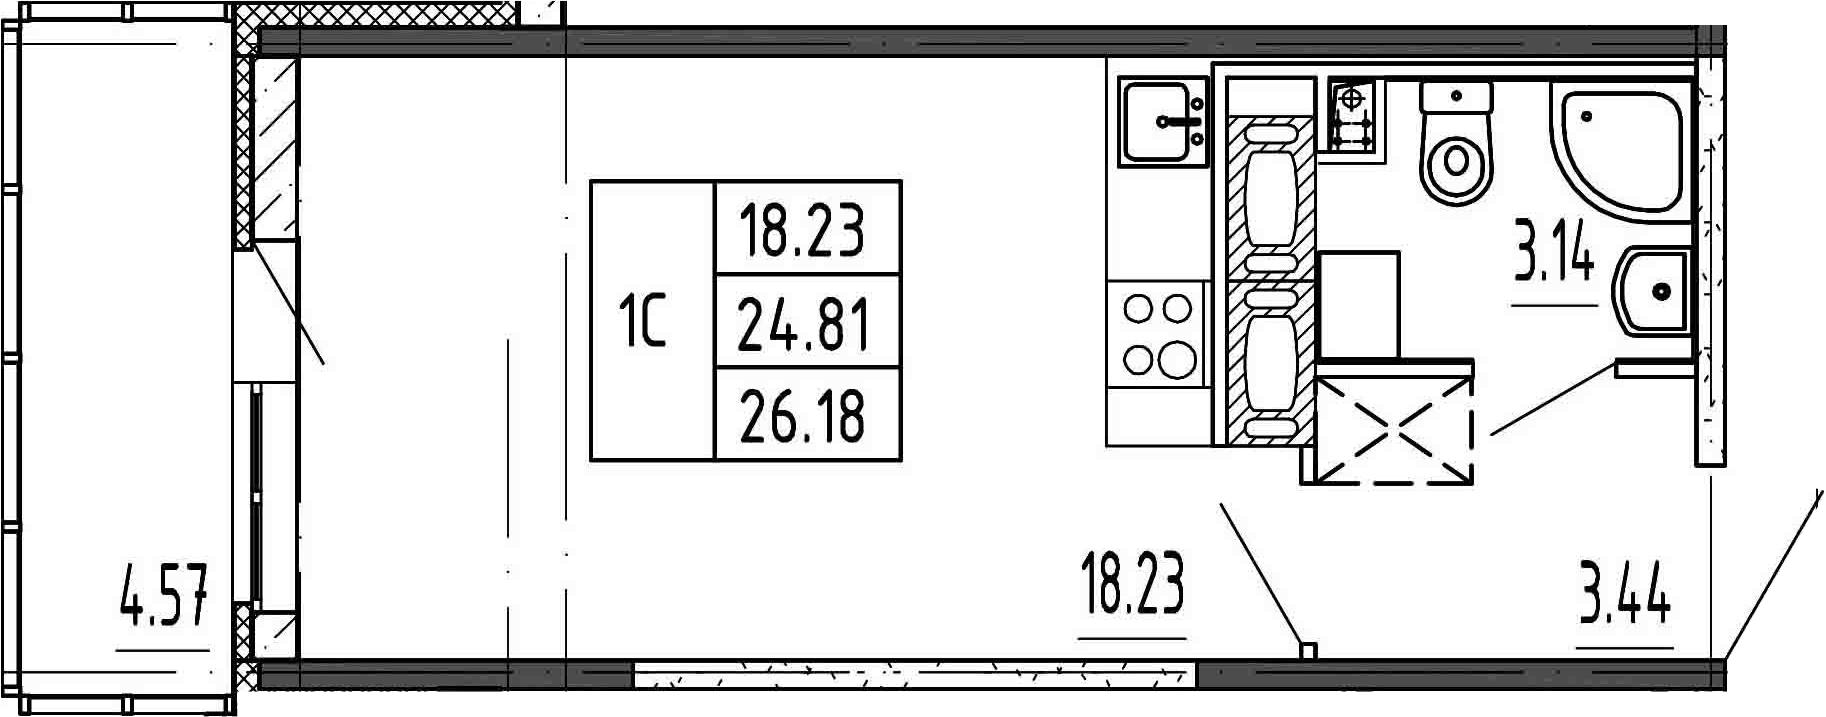 Студия, 24.81 м²